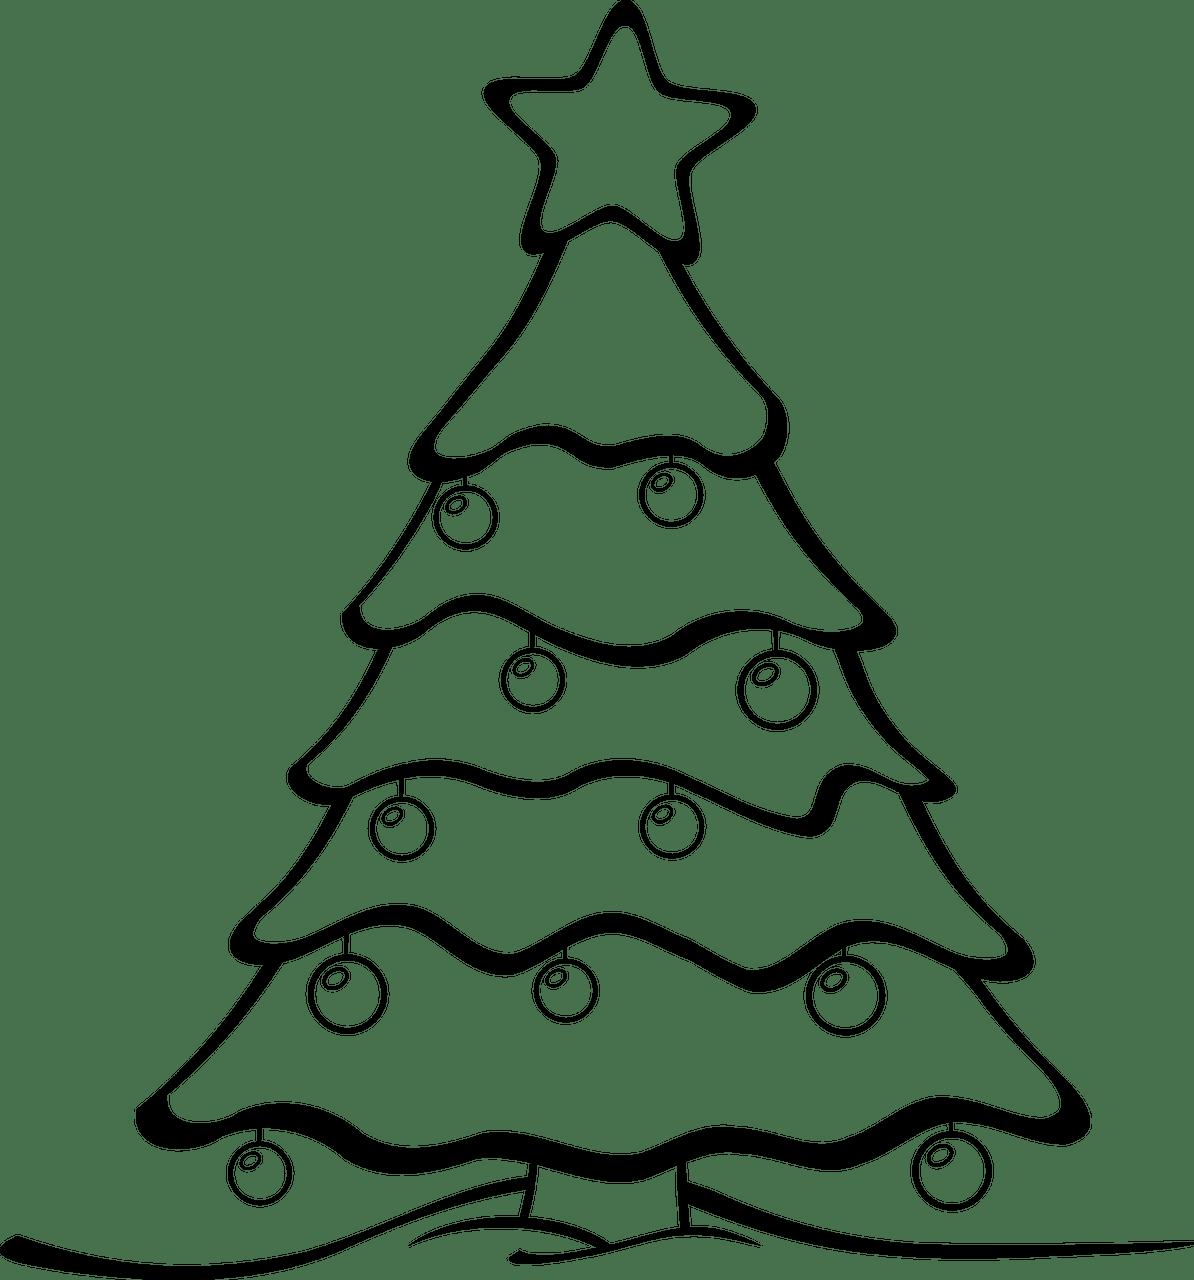 Clipart trees math. Christmas printables acur lunamedia